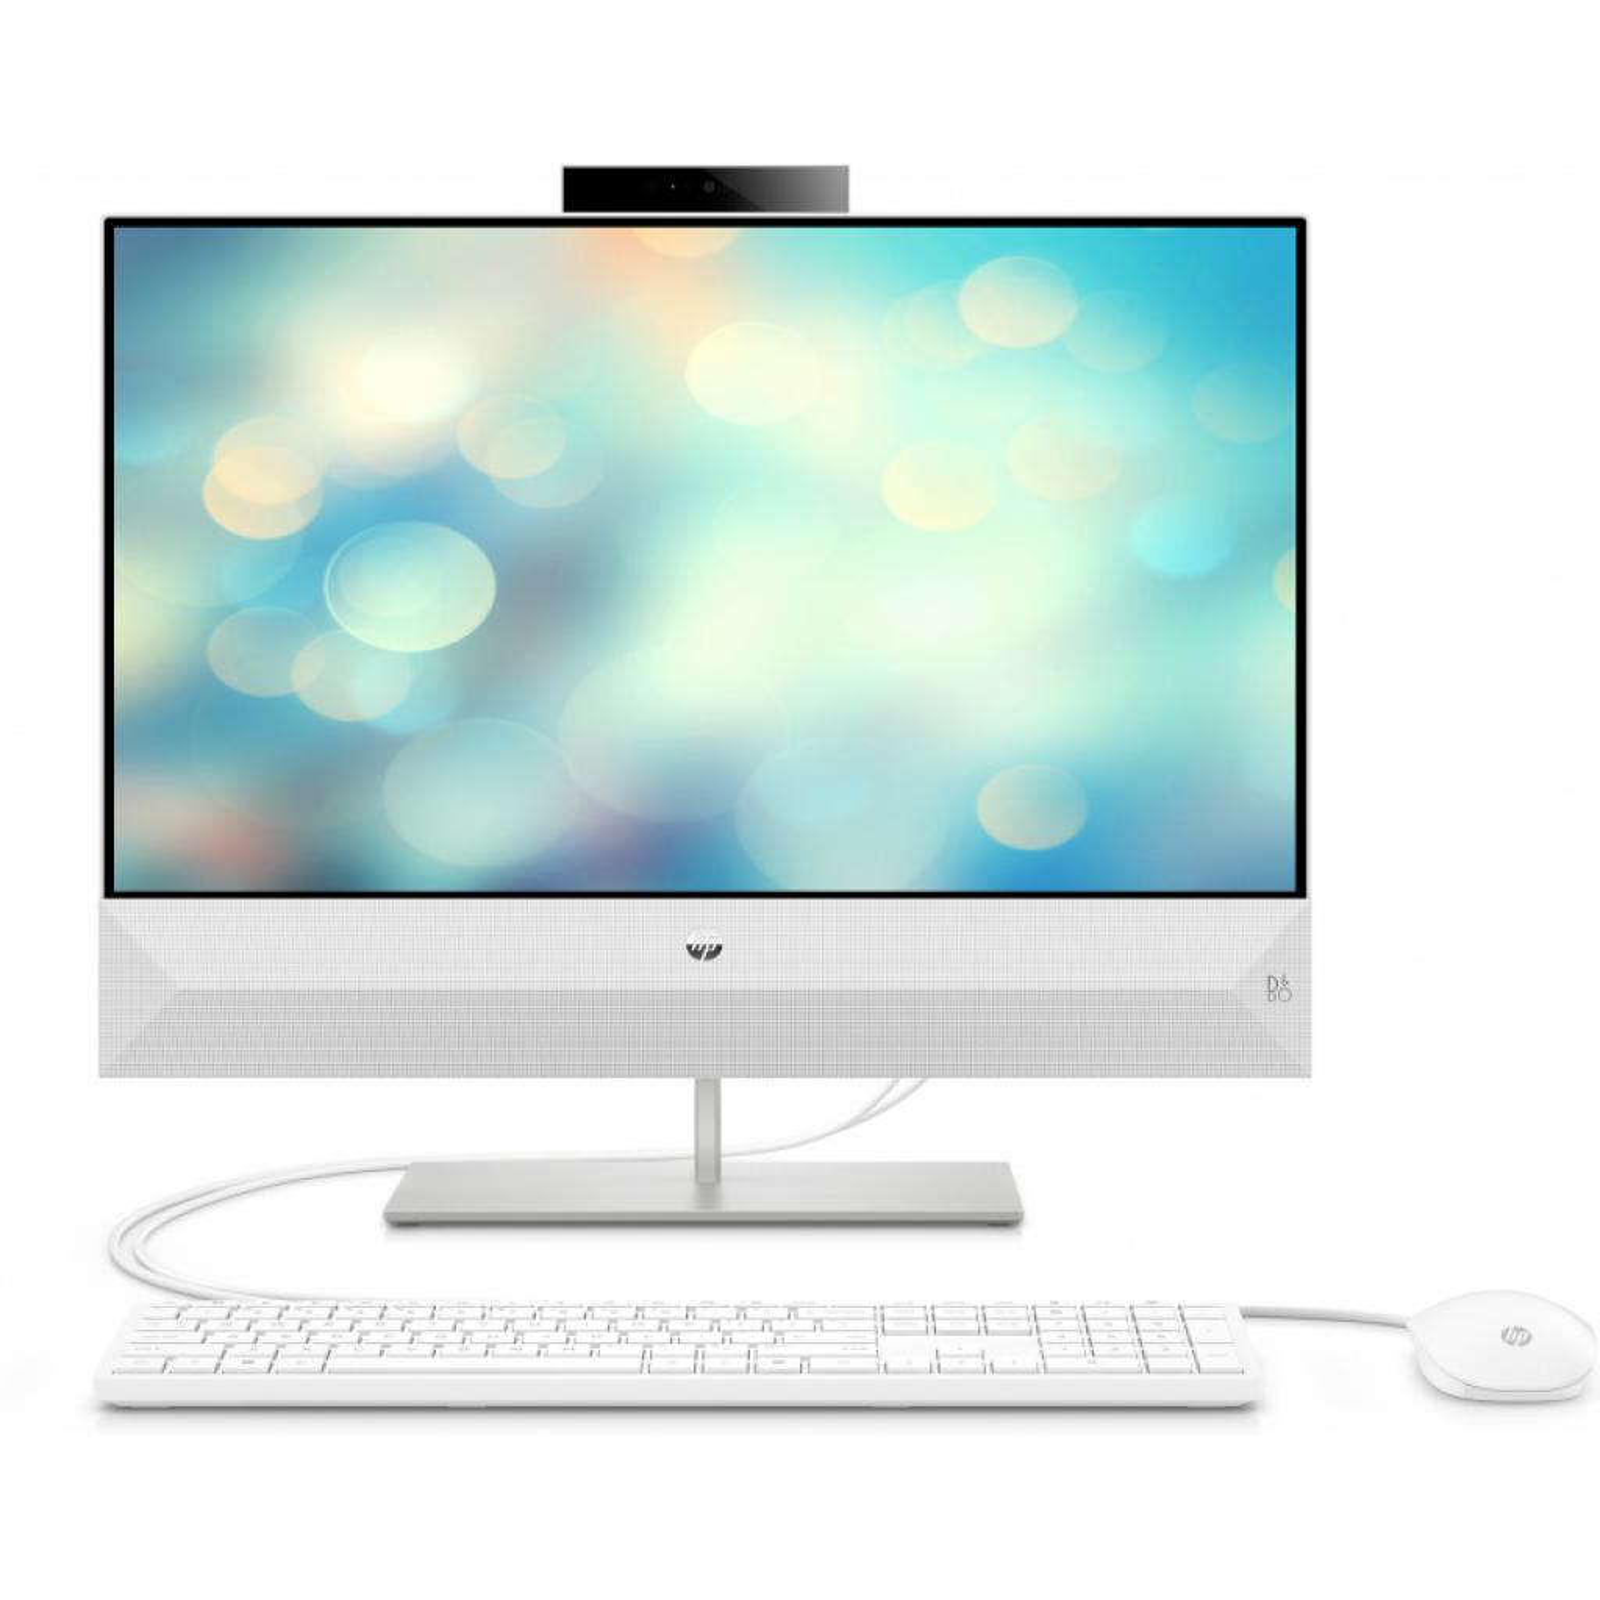 Компьютер HP Pavilion / i7-9700T (7JU12EA)